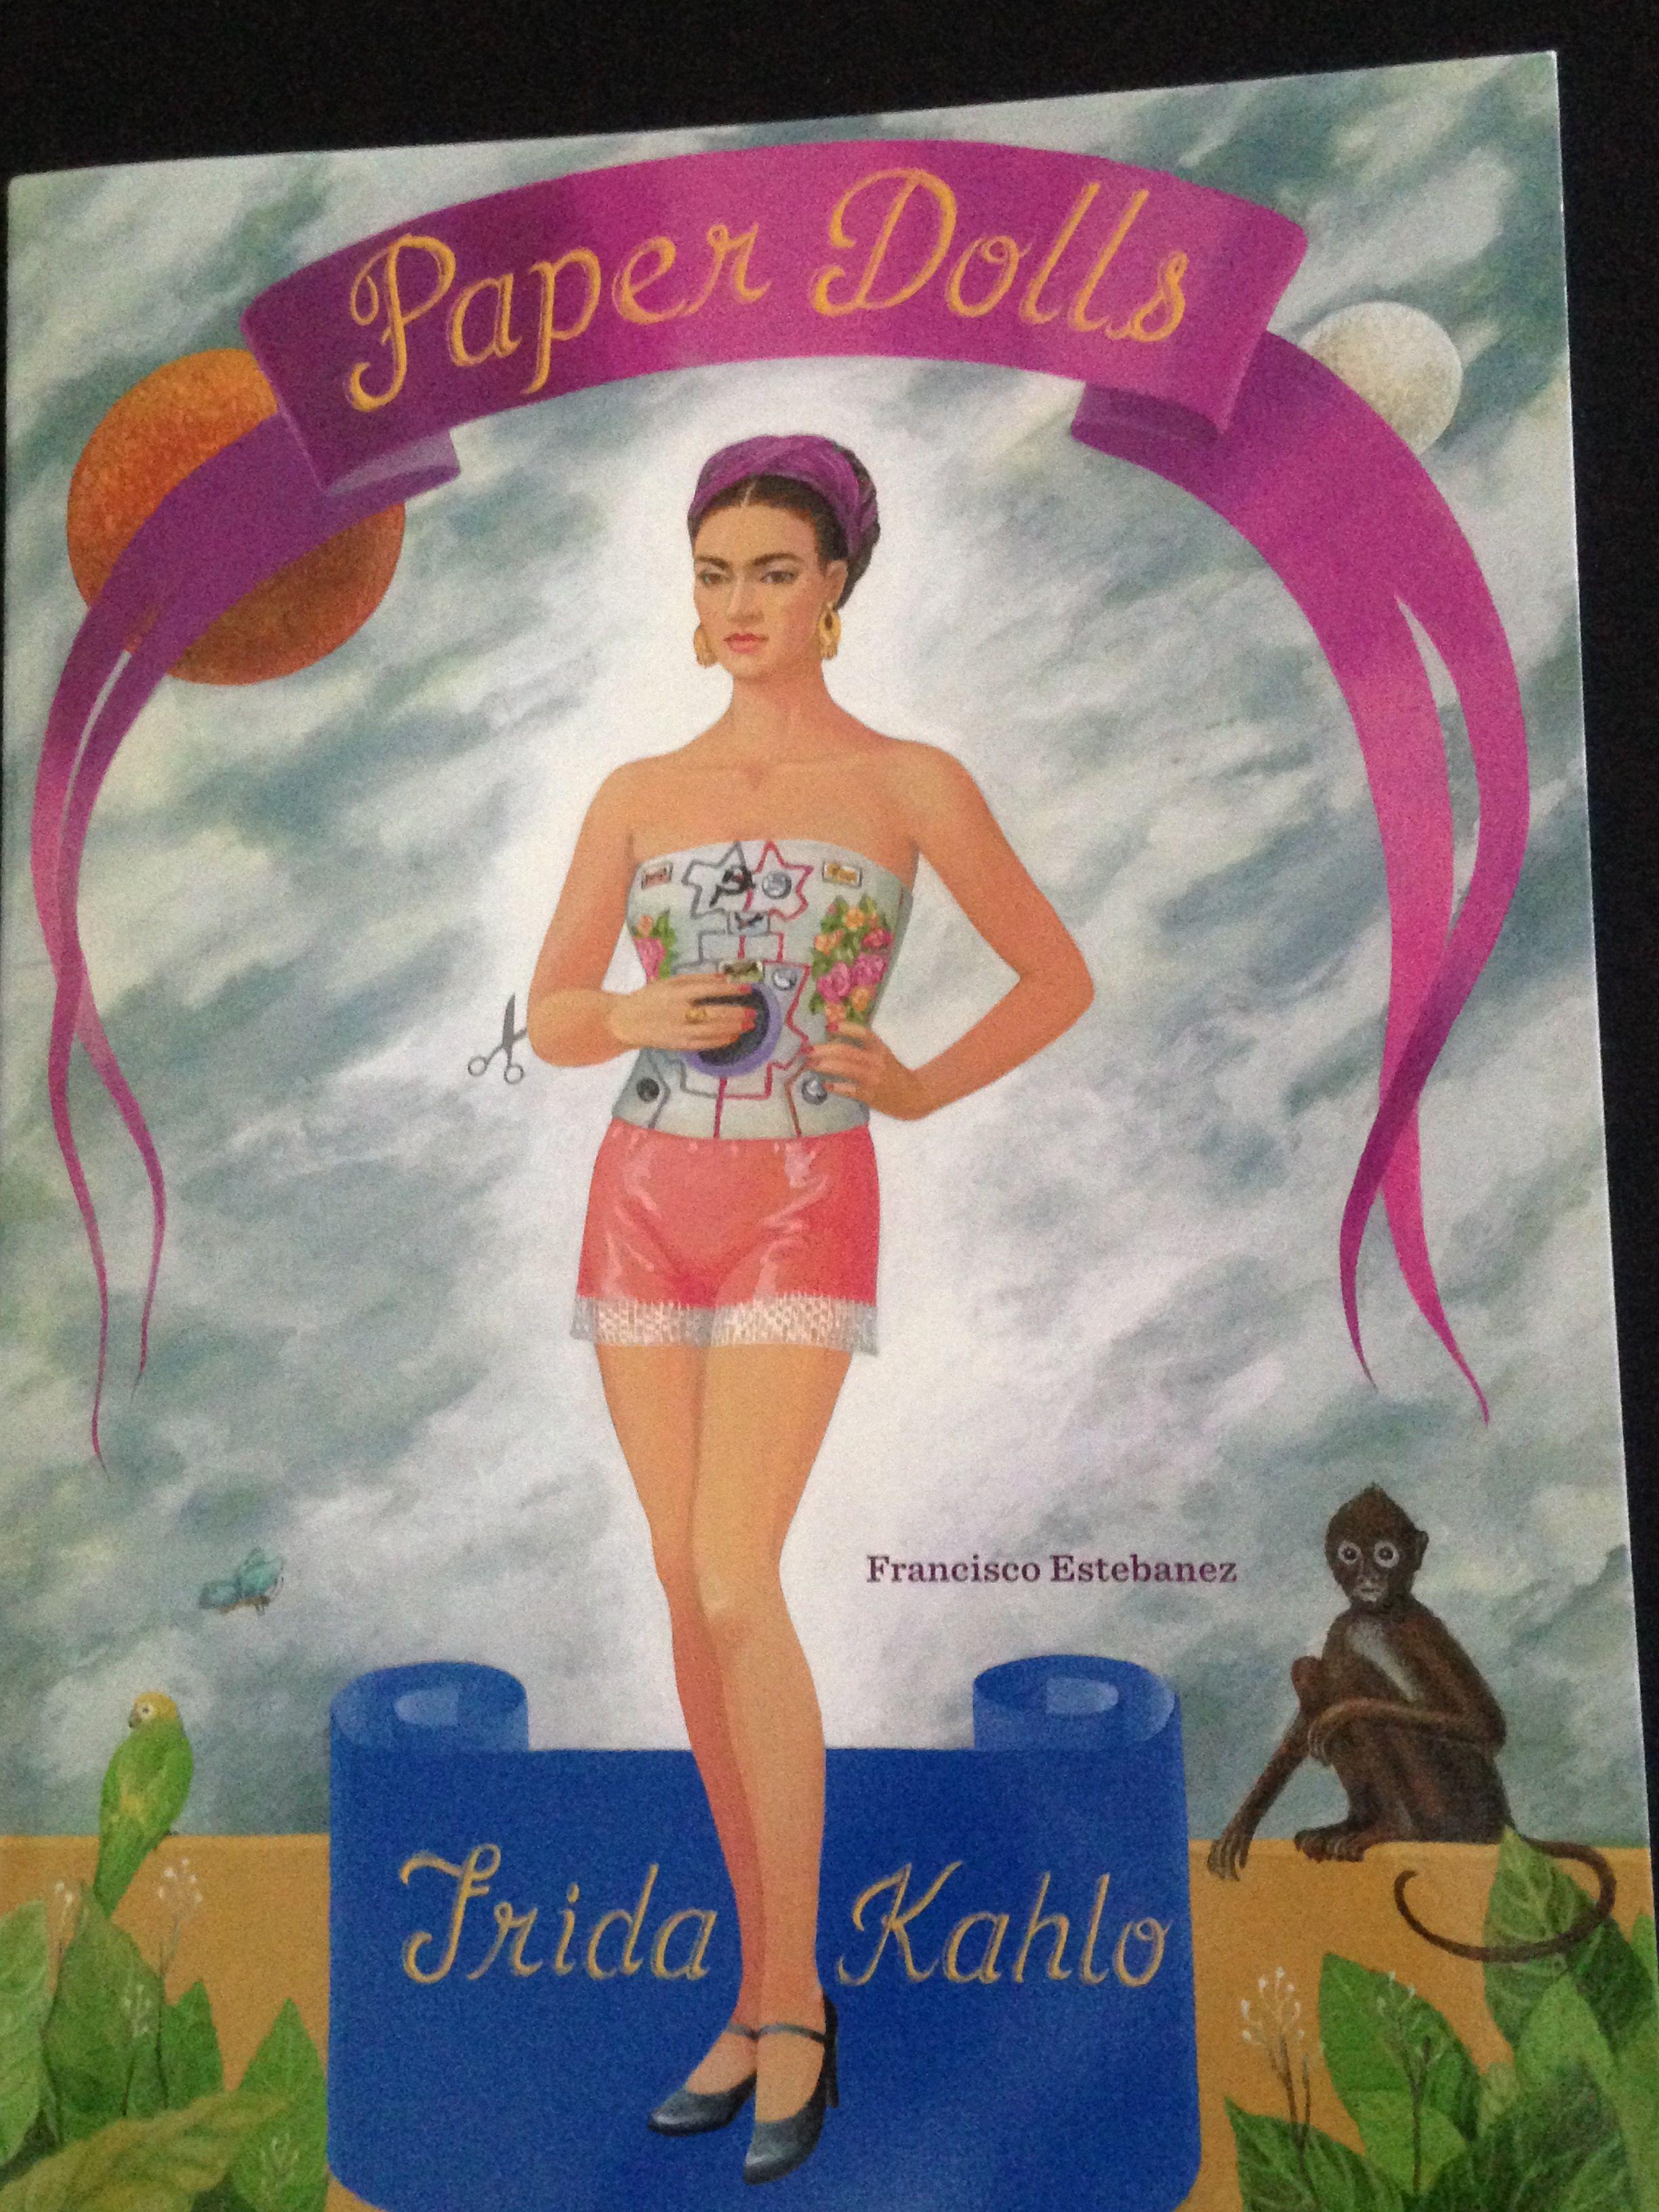 1999 Frida Kahlo | My Own Paperdolls | Pinterest